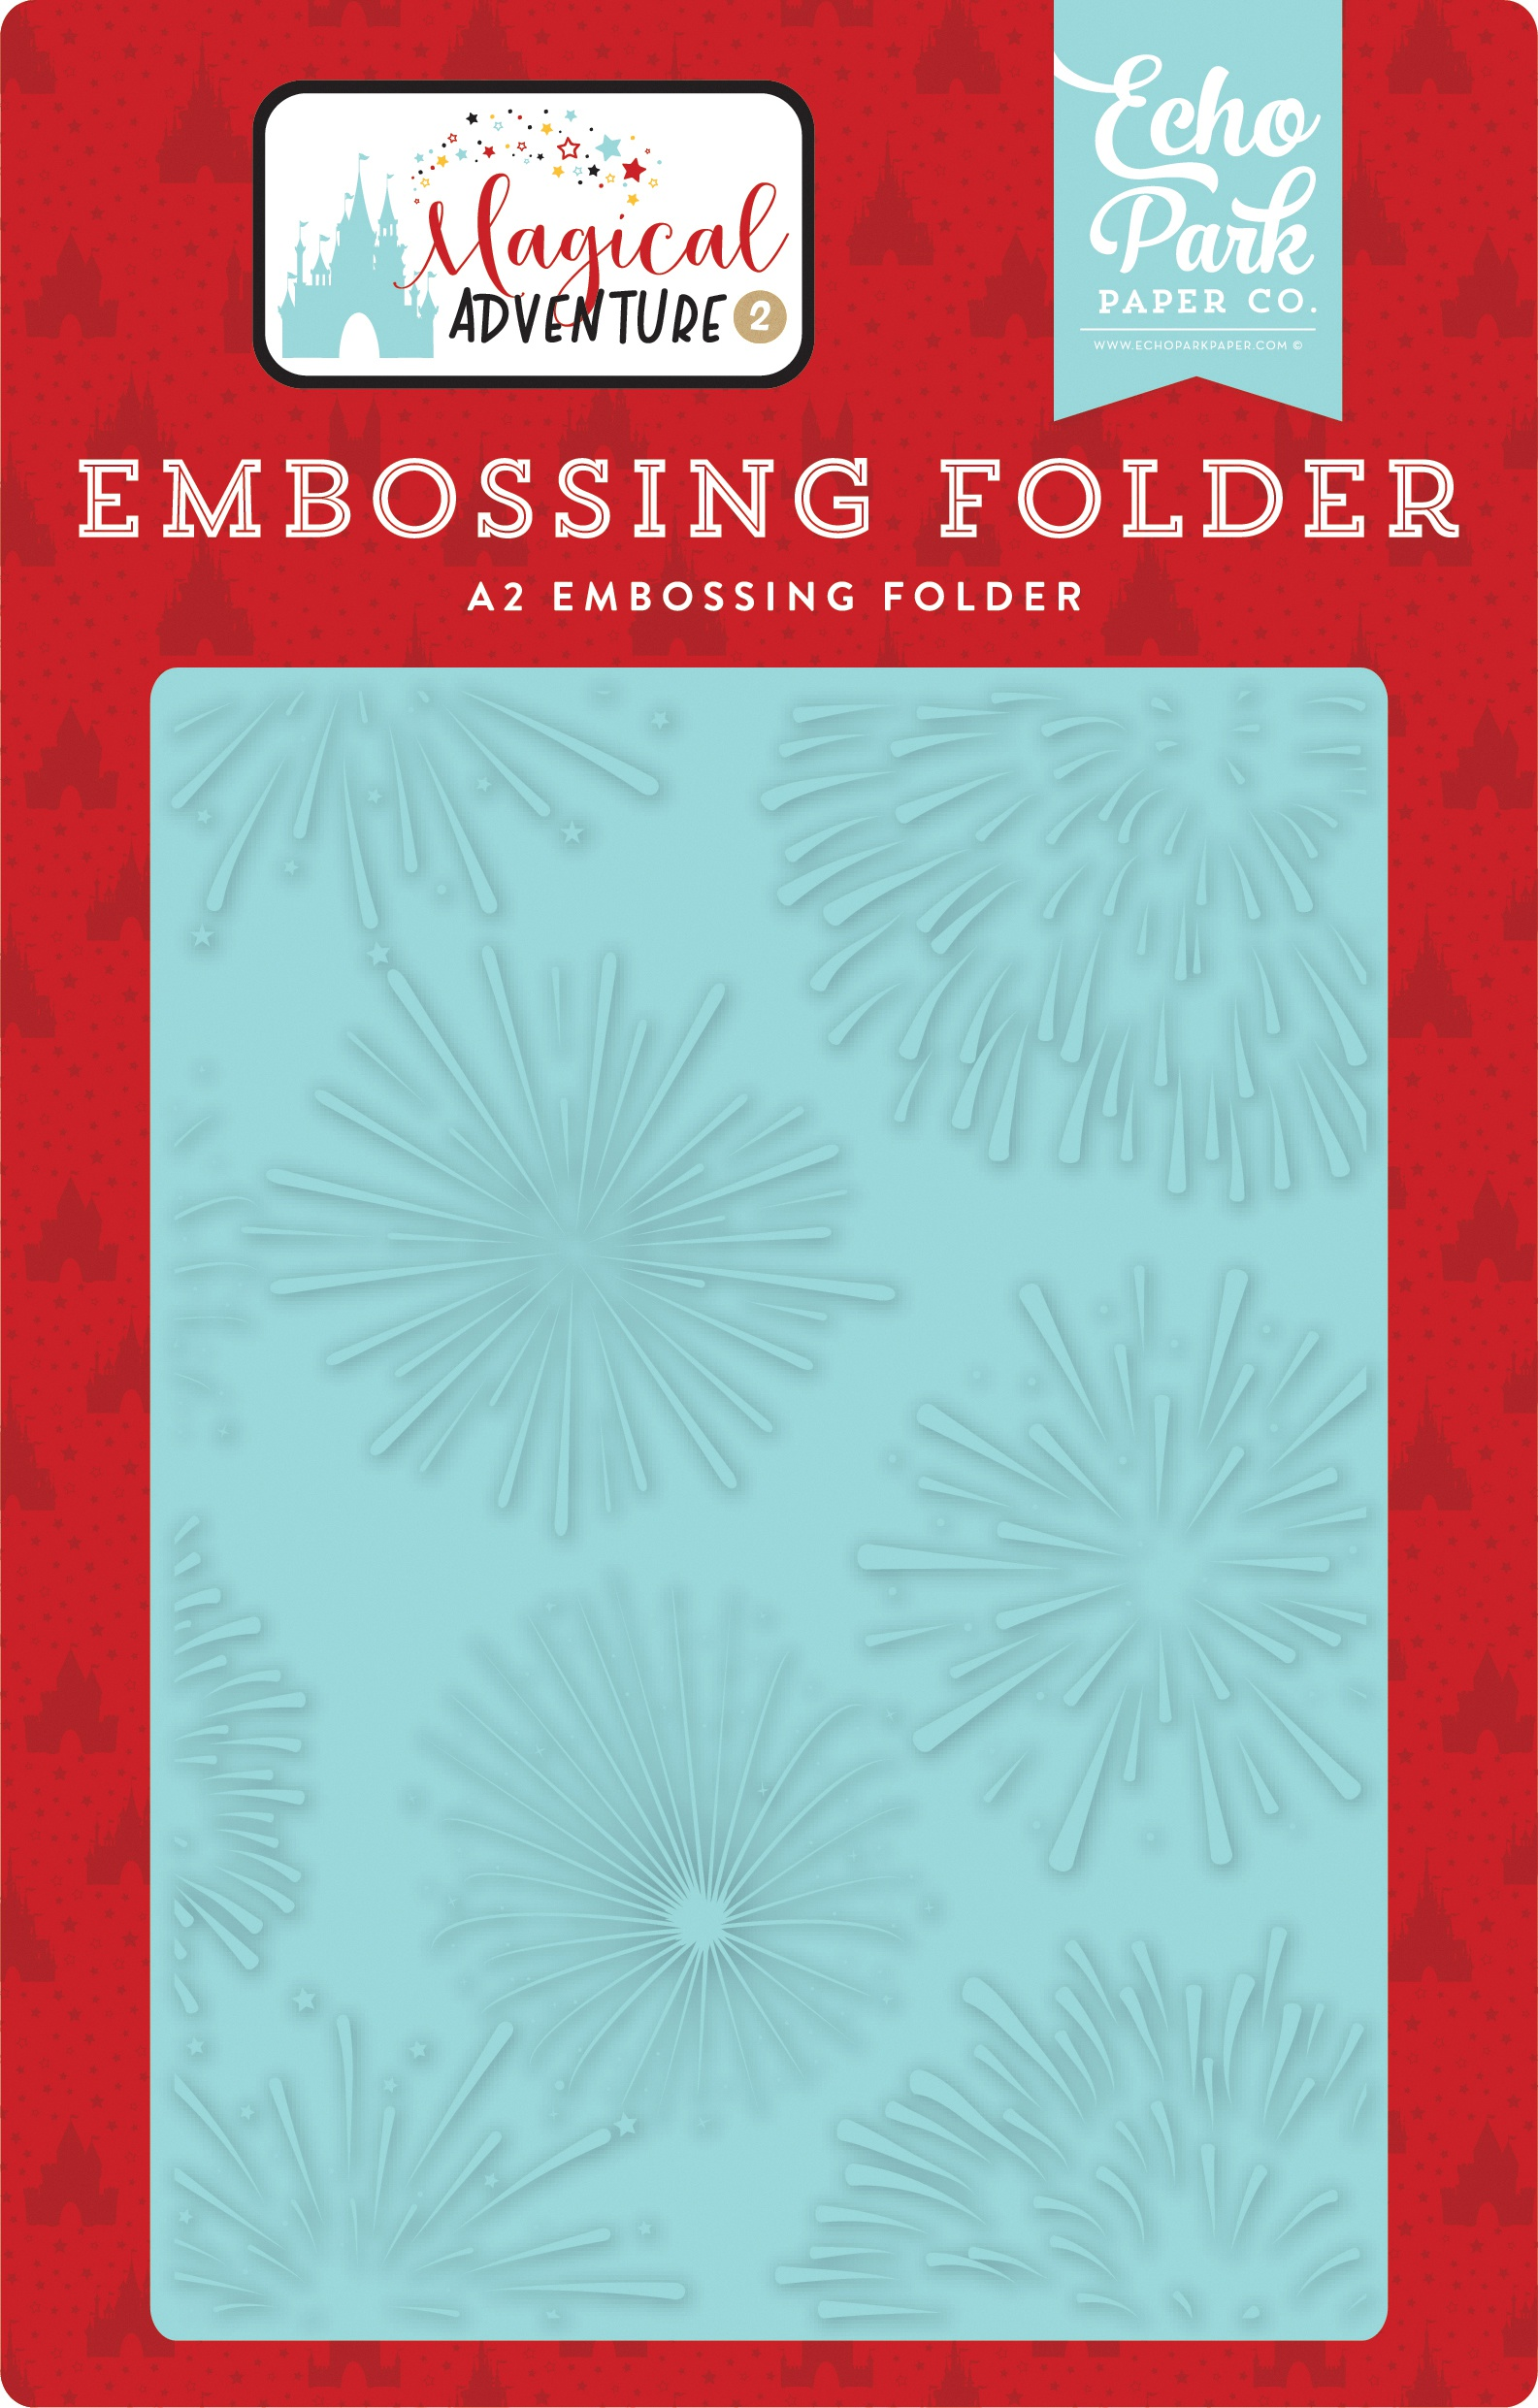 Echo Park Embossing Folder A2-Firework Magic